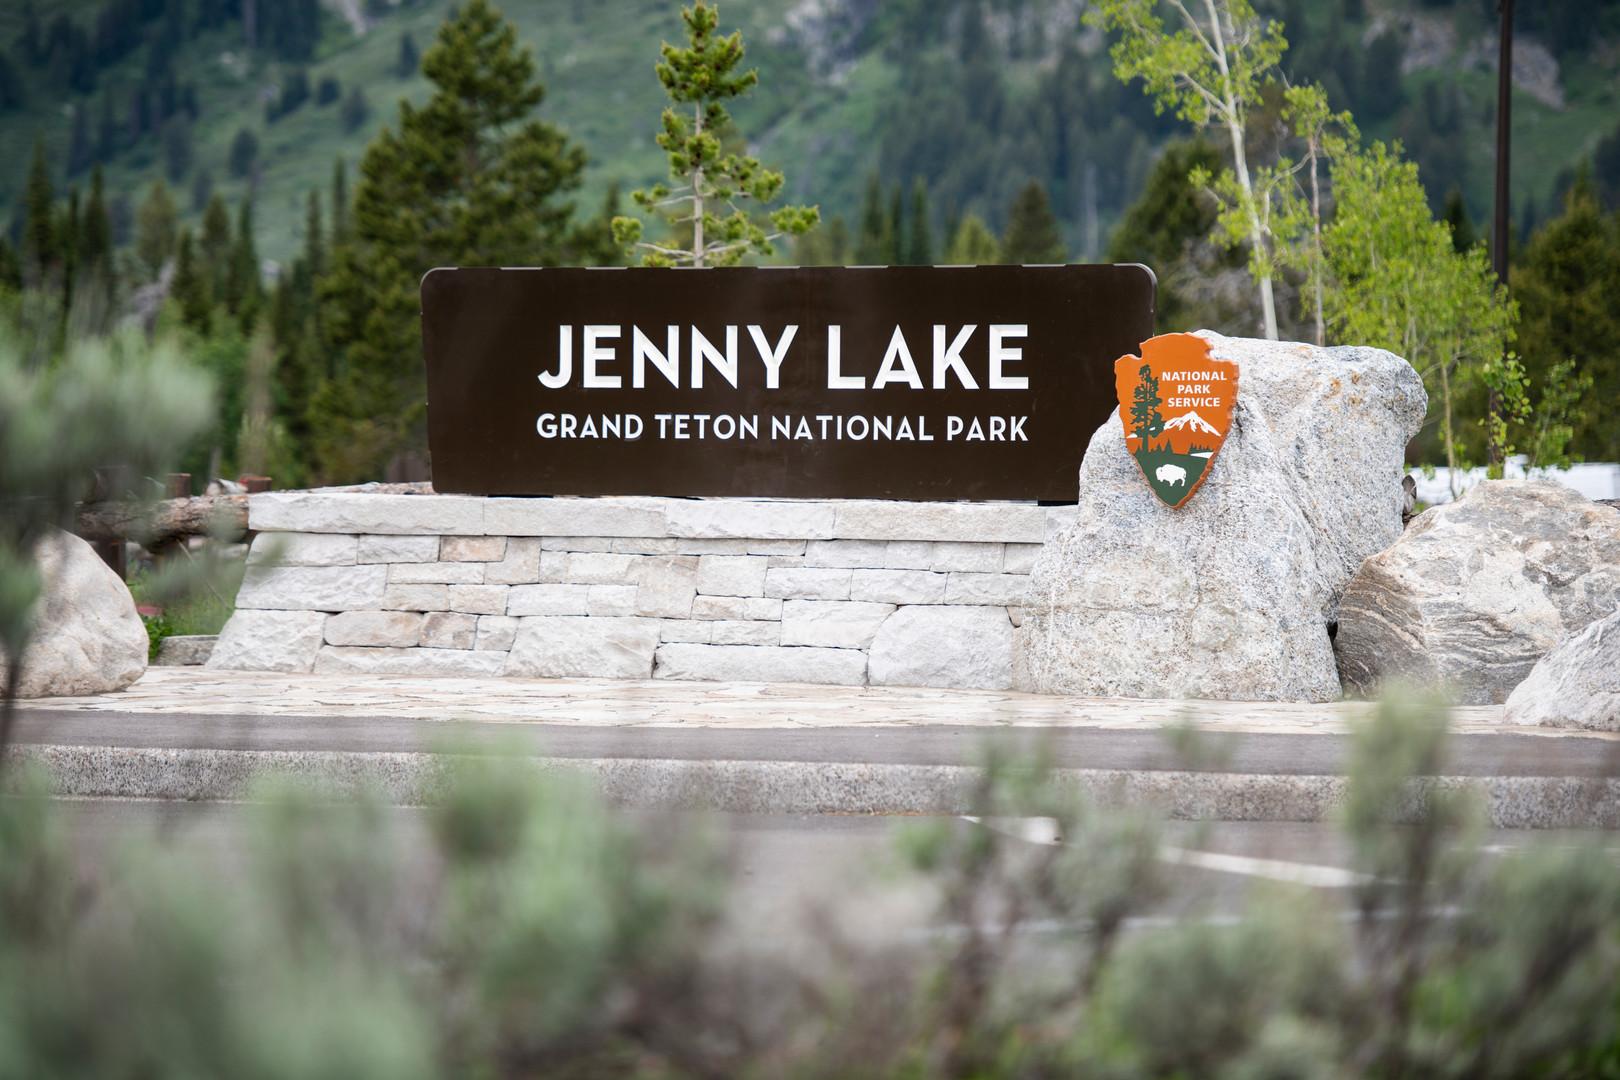 Sheets_Studios_Jenny_Lake-8932.jpg